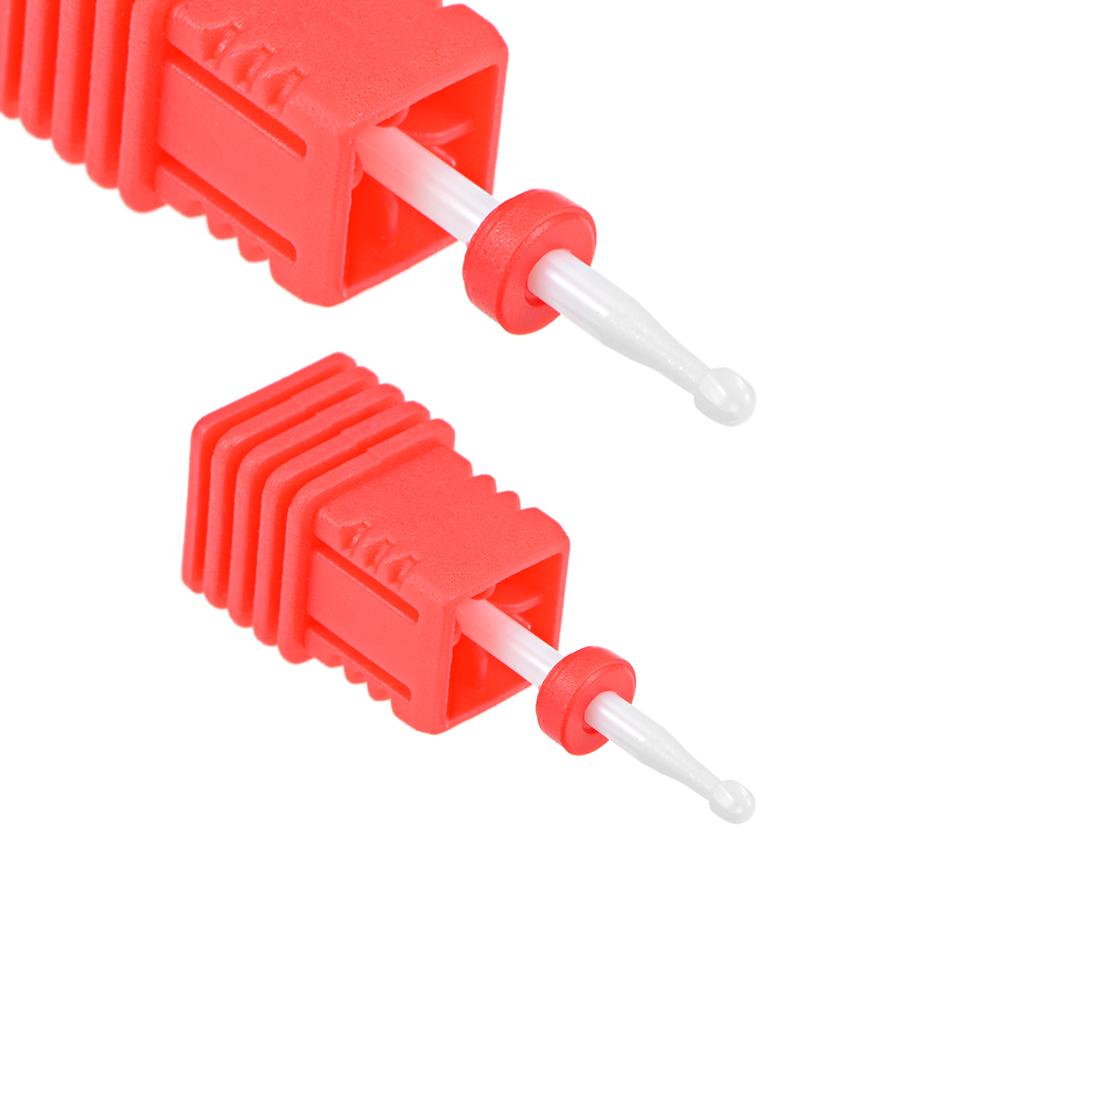 2pcs Ceramic Nail Drill Bit 3/32 Fine Grit Nails File Bit for Manicure Pedicure